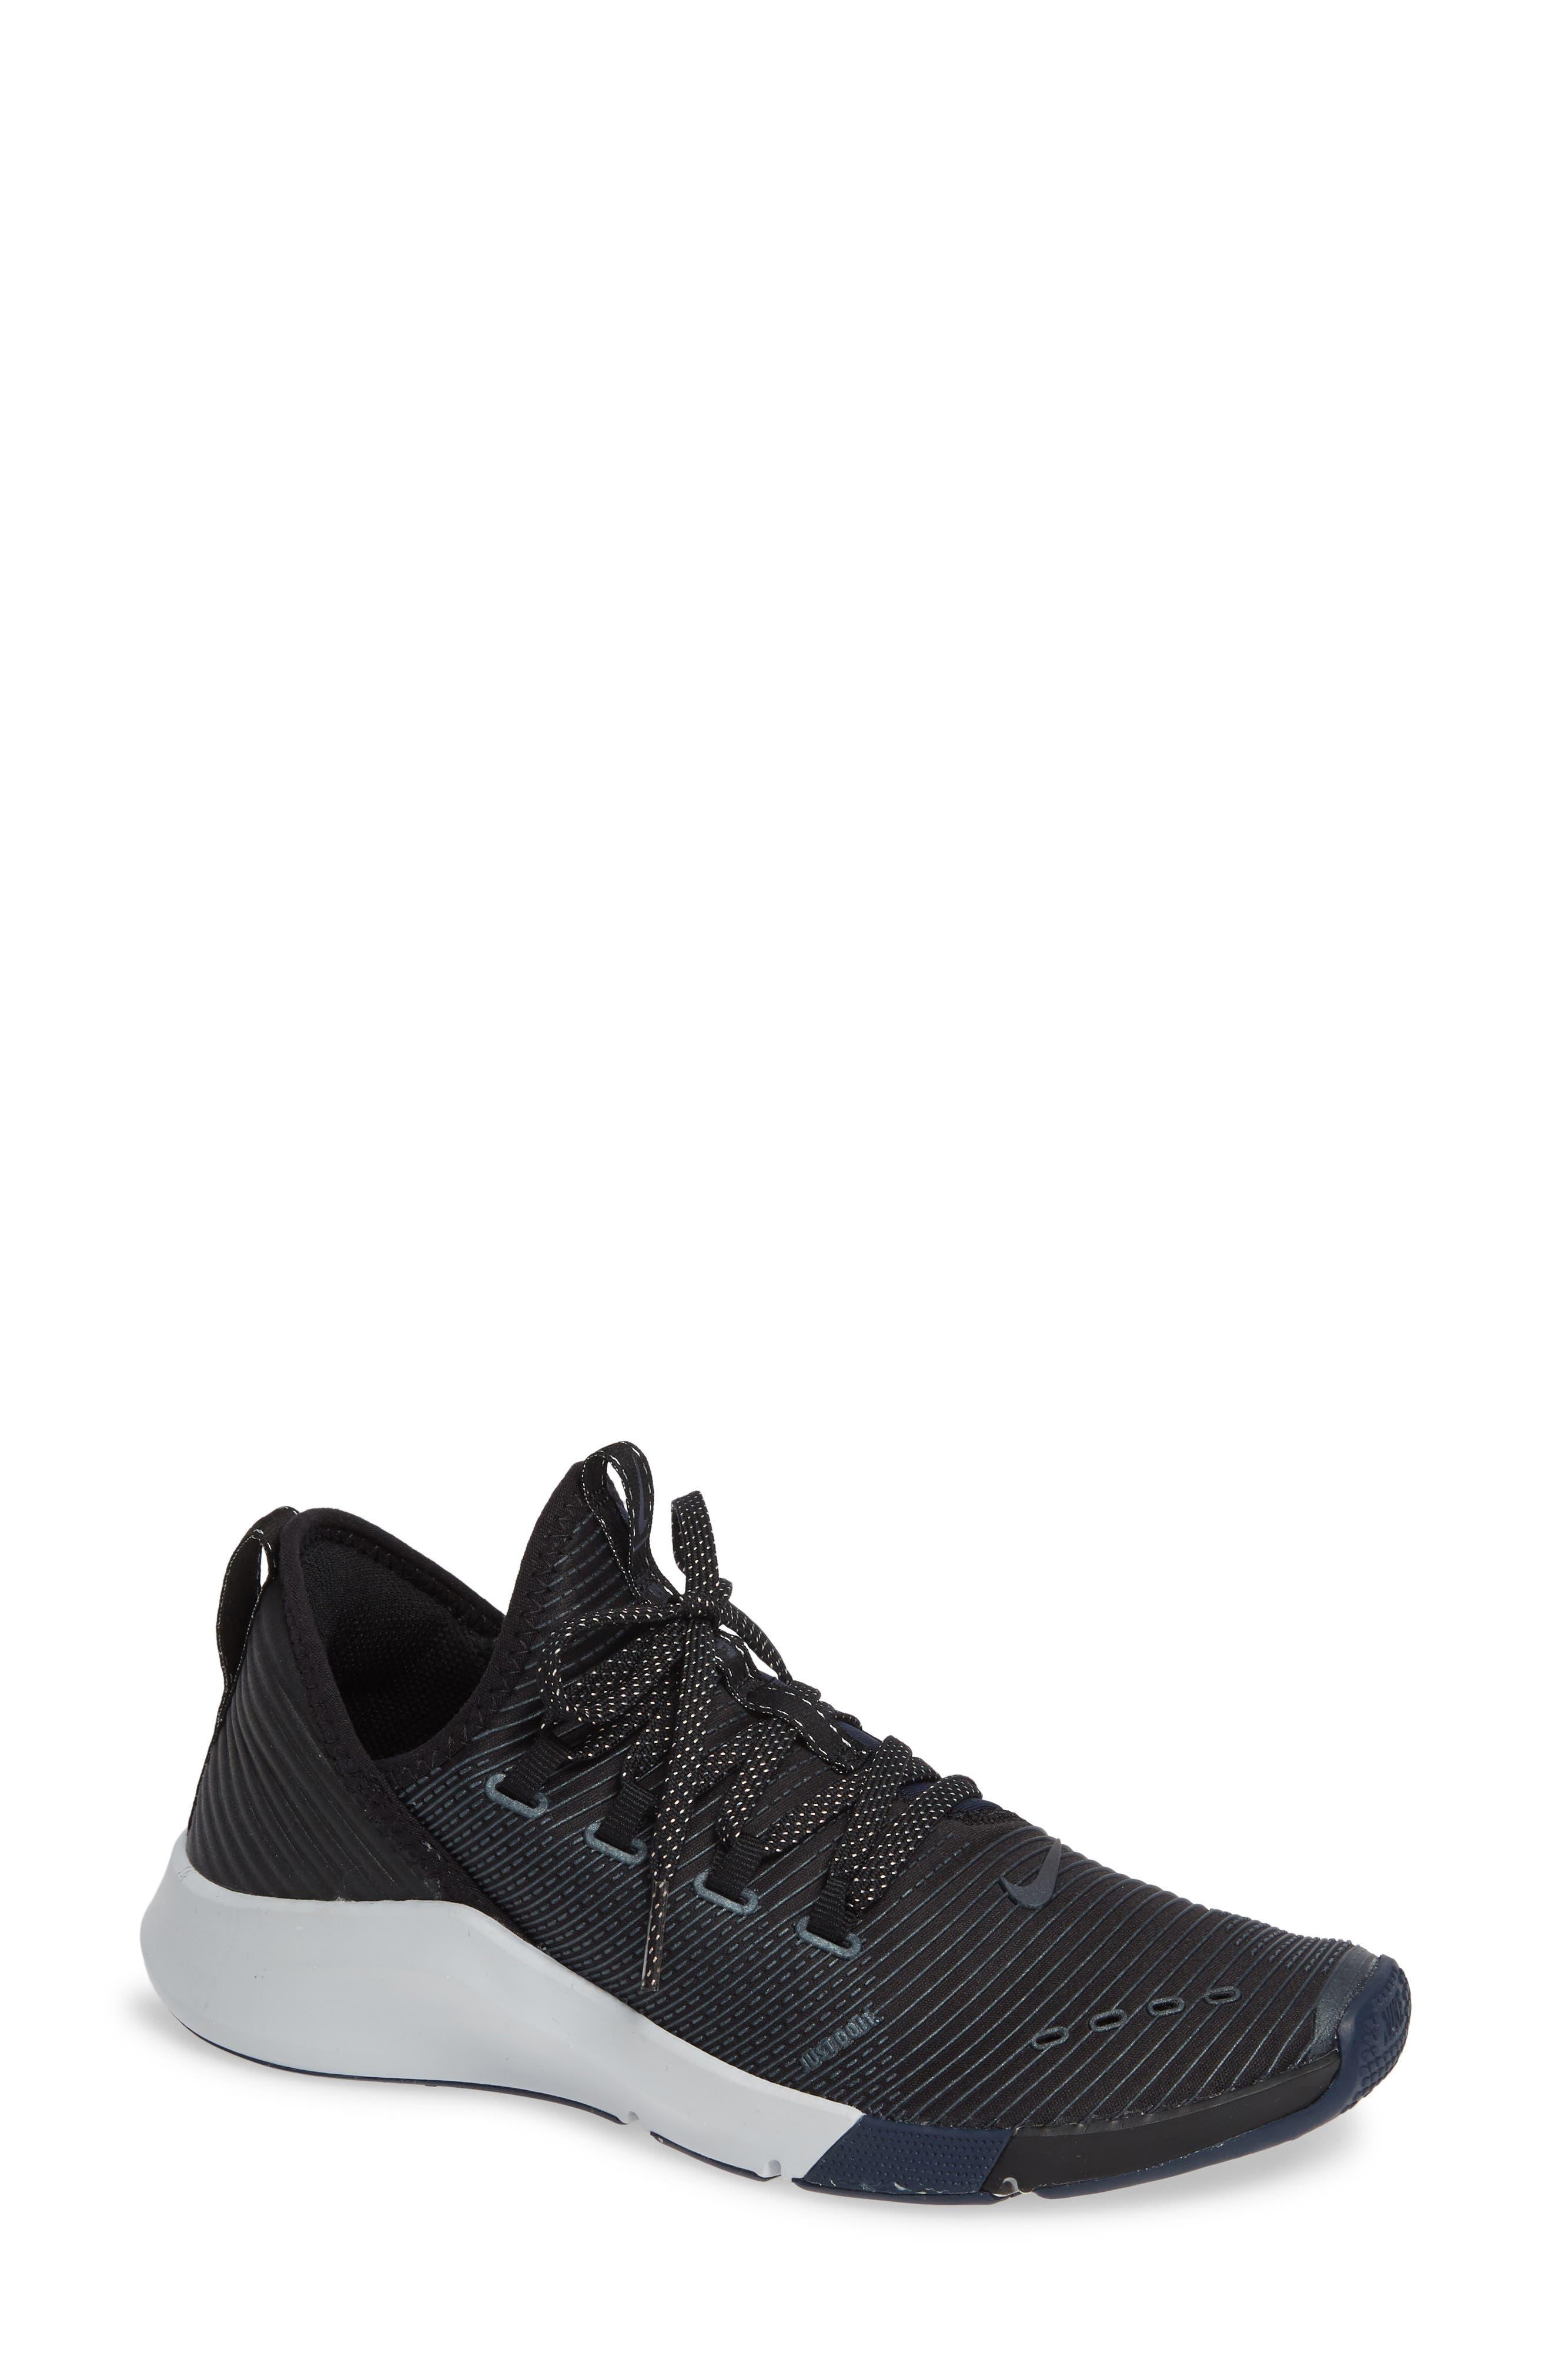 NIKE,                             Air Zoom Elevate Training Shoe,                             Main thumbnail 1, color,                             BLACK/ METALLIC NAVY- NAVY